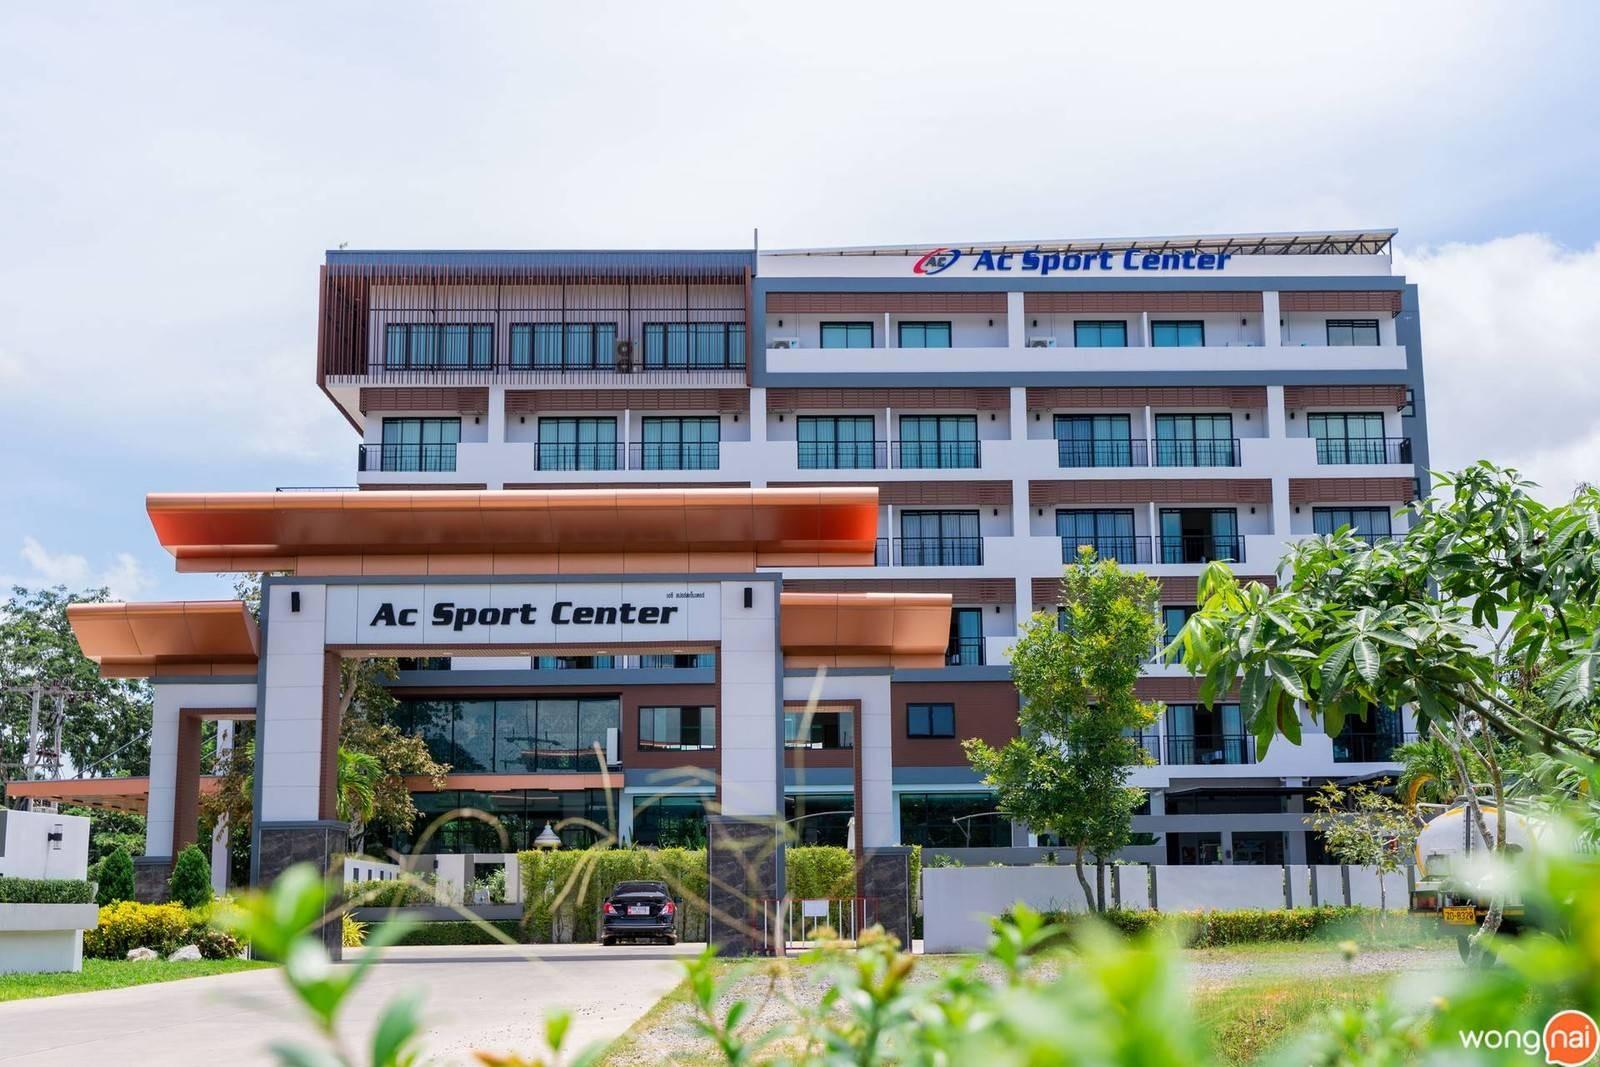 AC Sport Center